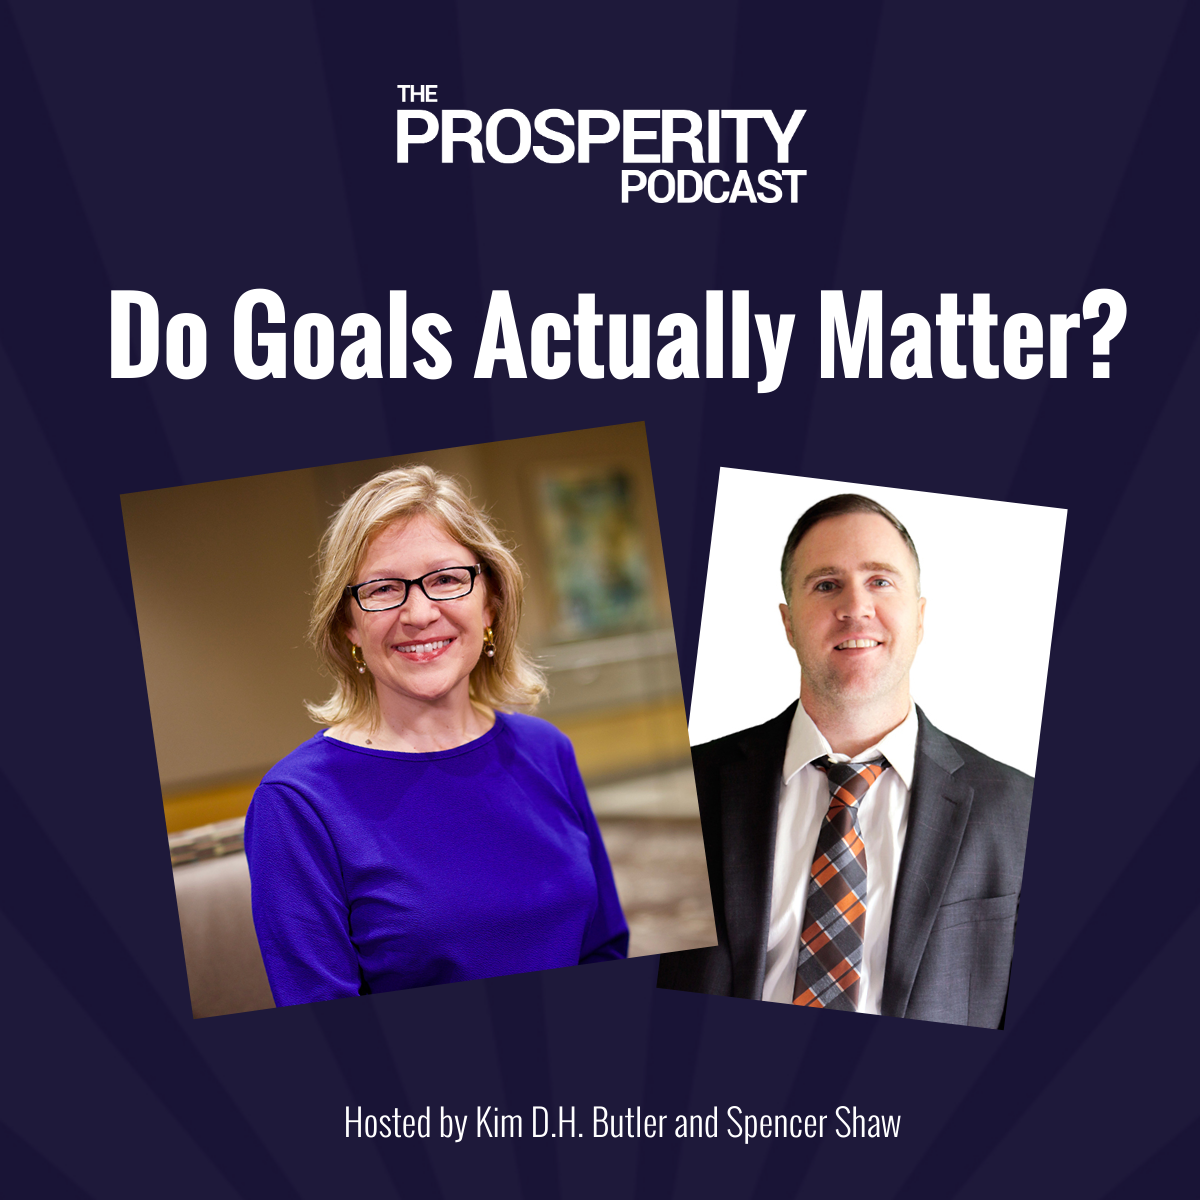 Do Goals Actually Matter?